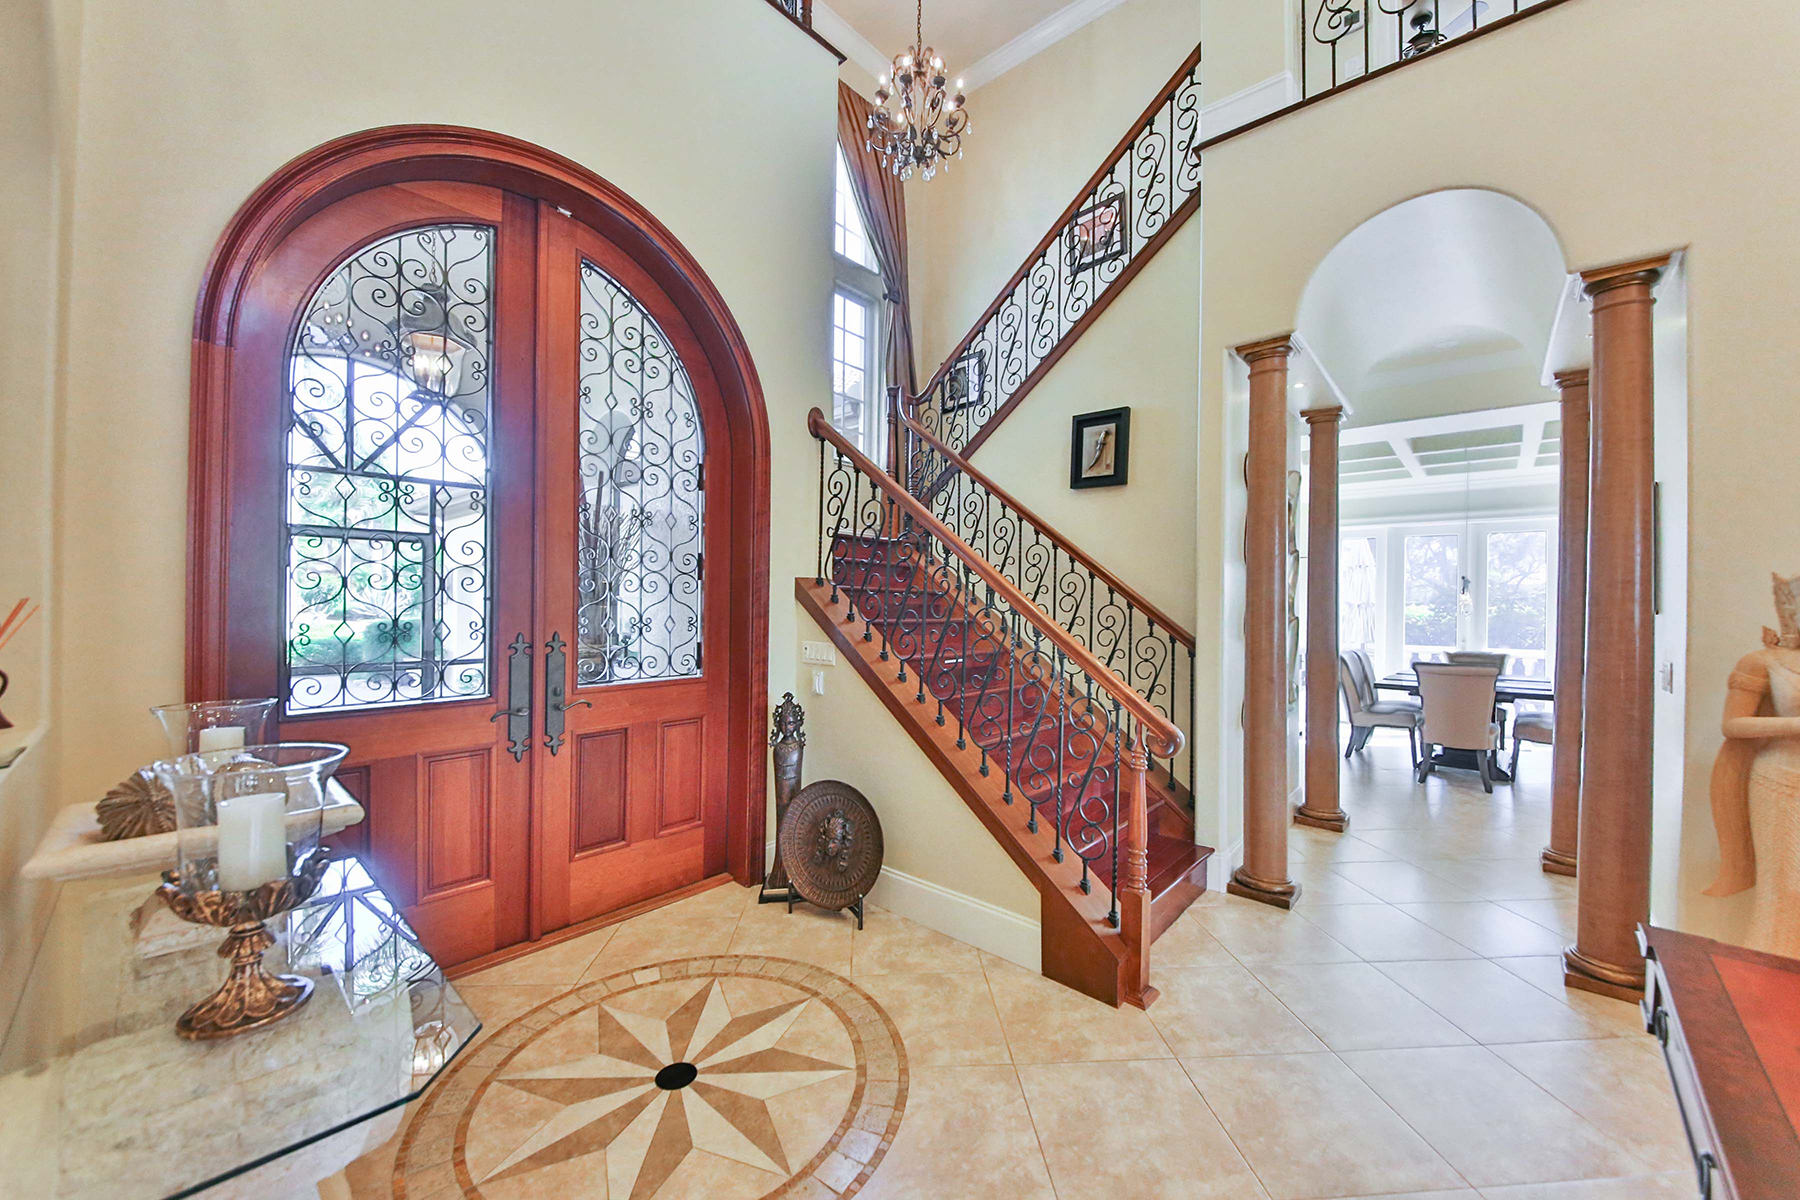 独户住宅 为 销售 在 LELY RESORT - TIGER ISLAND ESTATES 7912 Tiger Lily Dr 那不勒斯, 佛罗里达州, 34113 美国